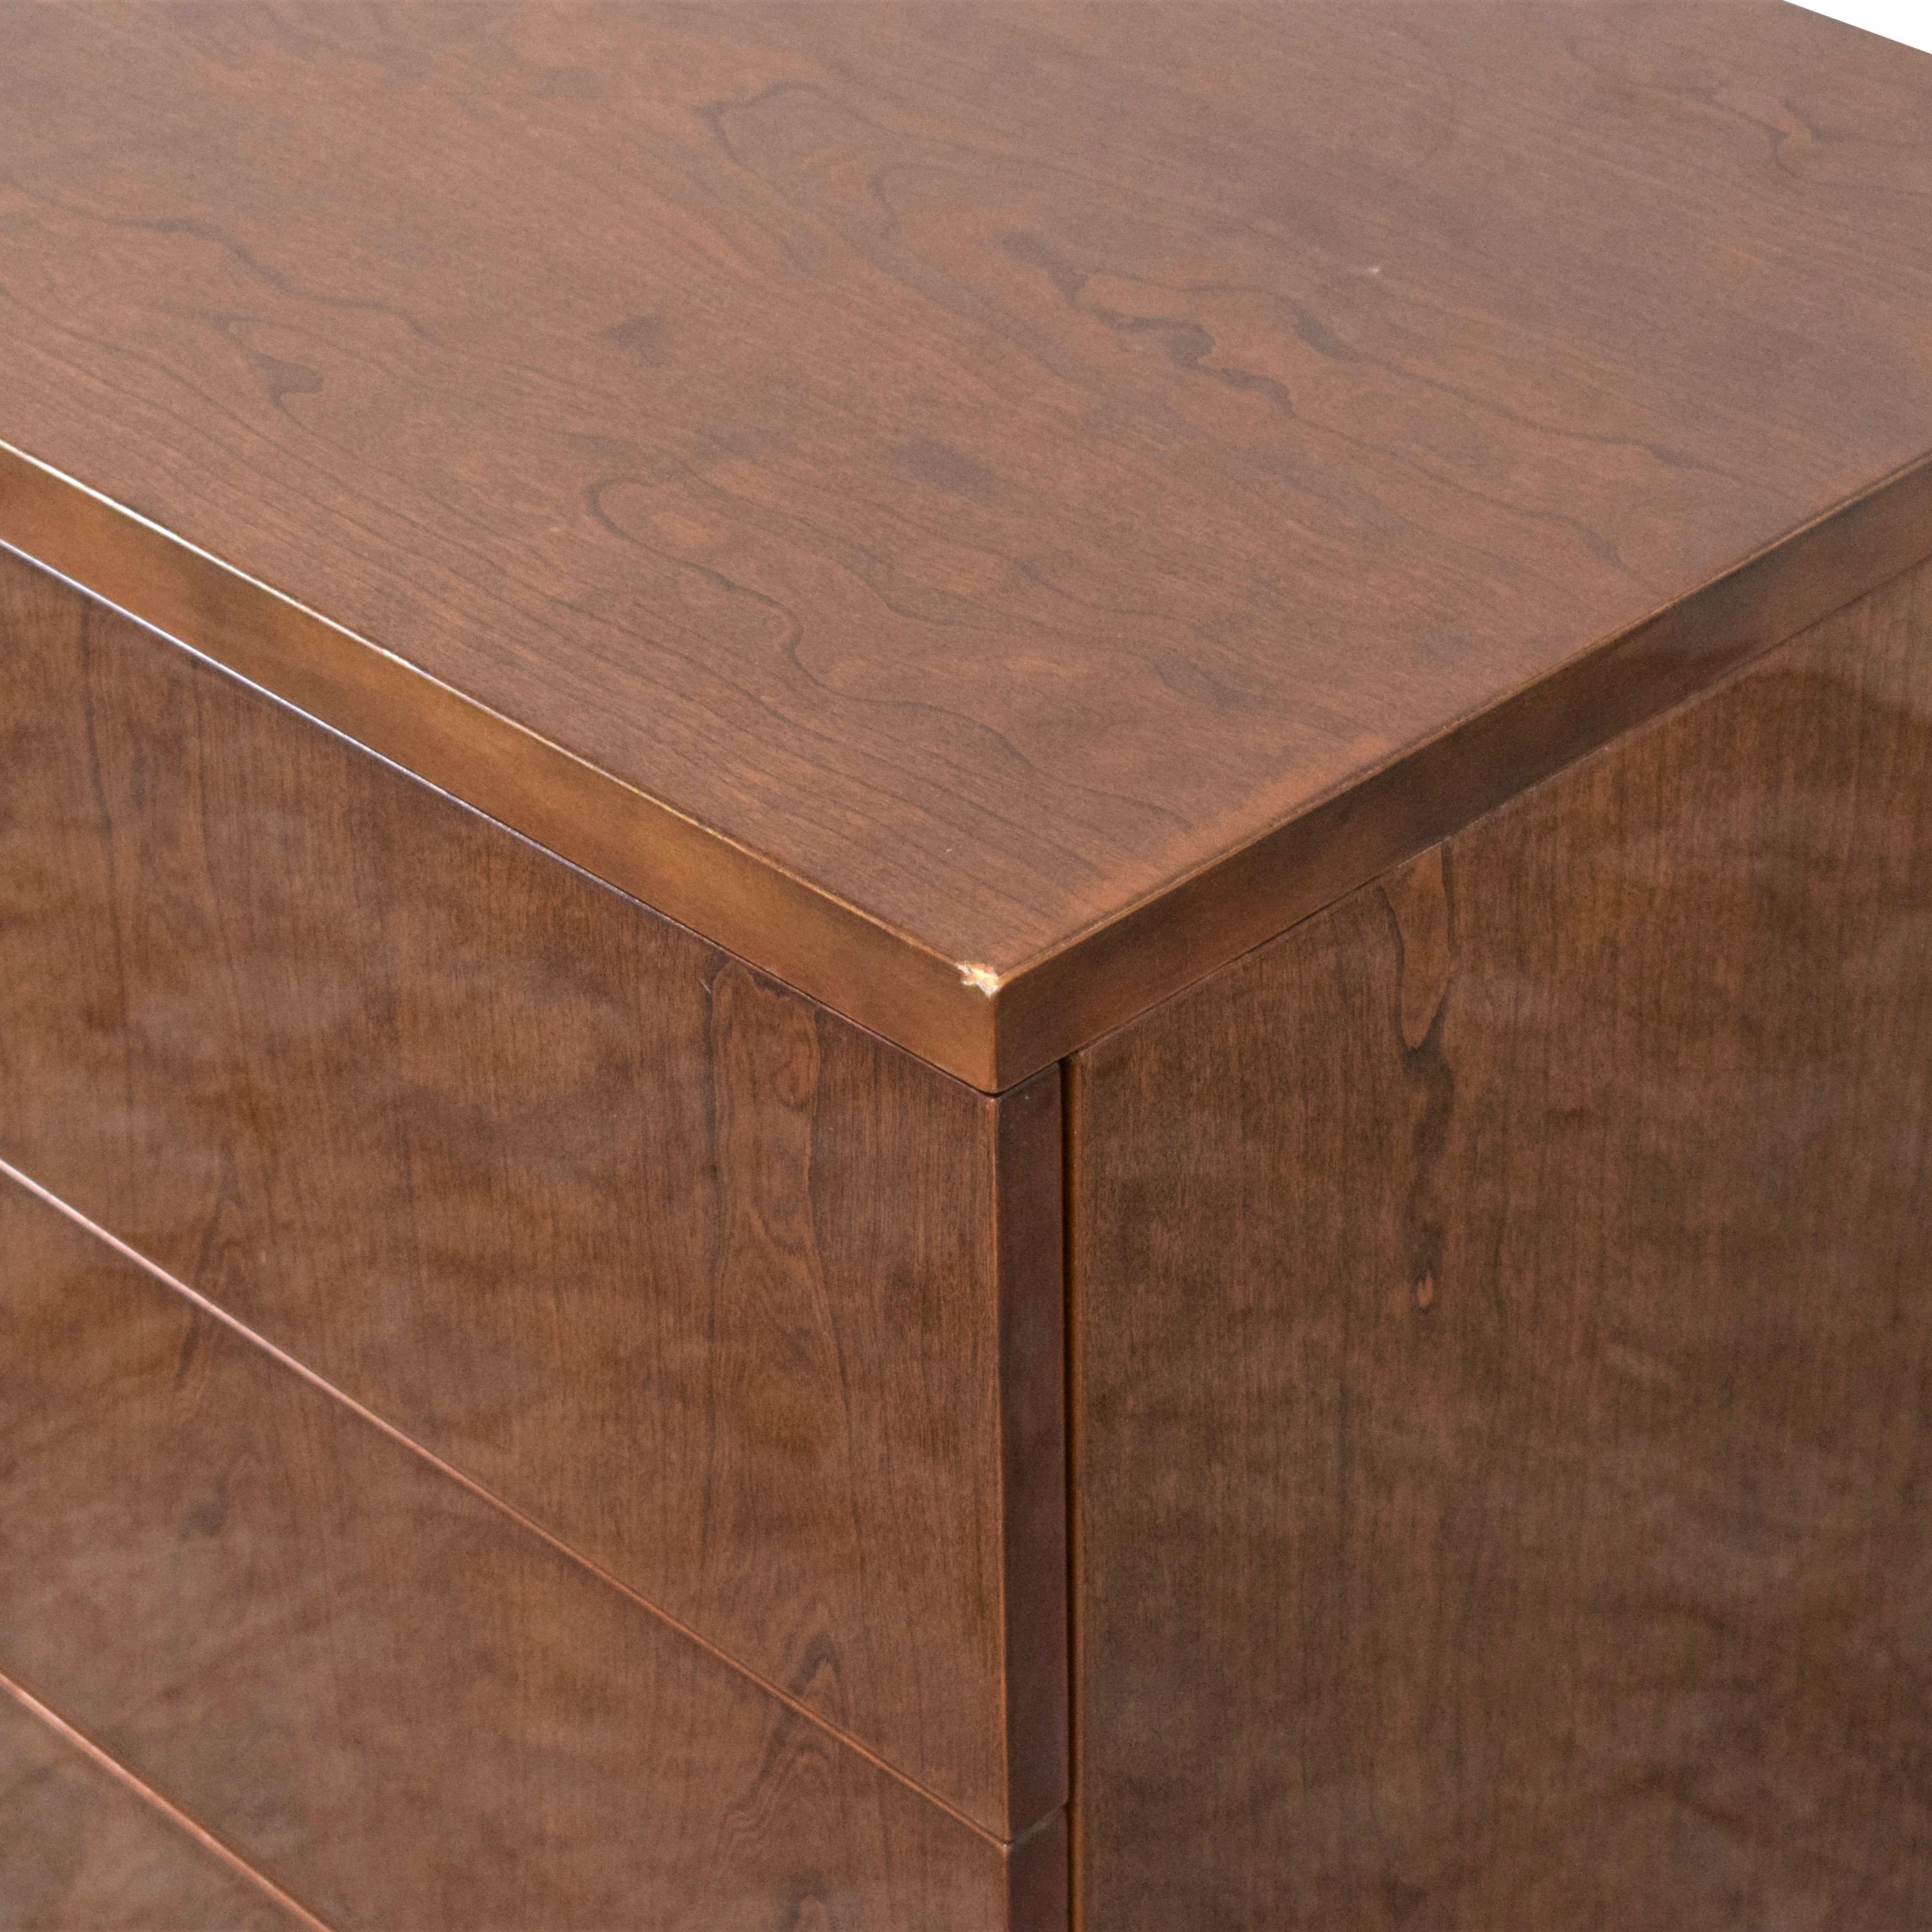 Henredon Furniture Henredon Furniture Six Drawer Dresser ct